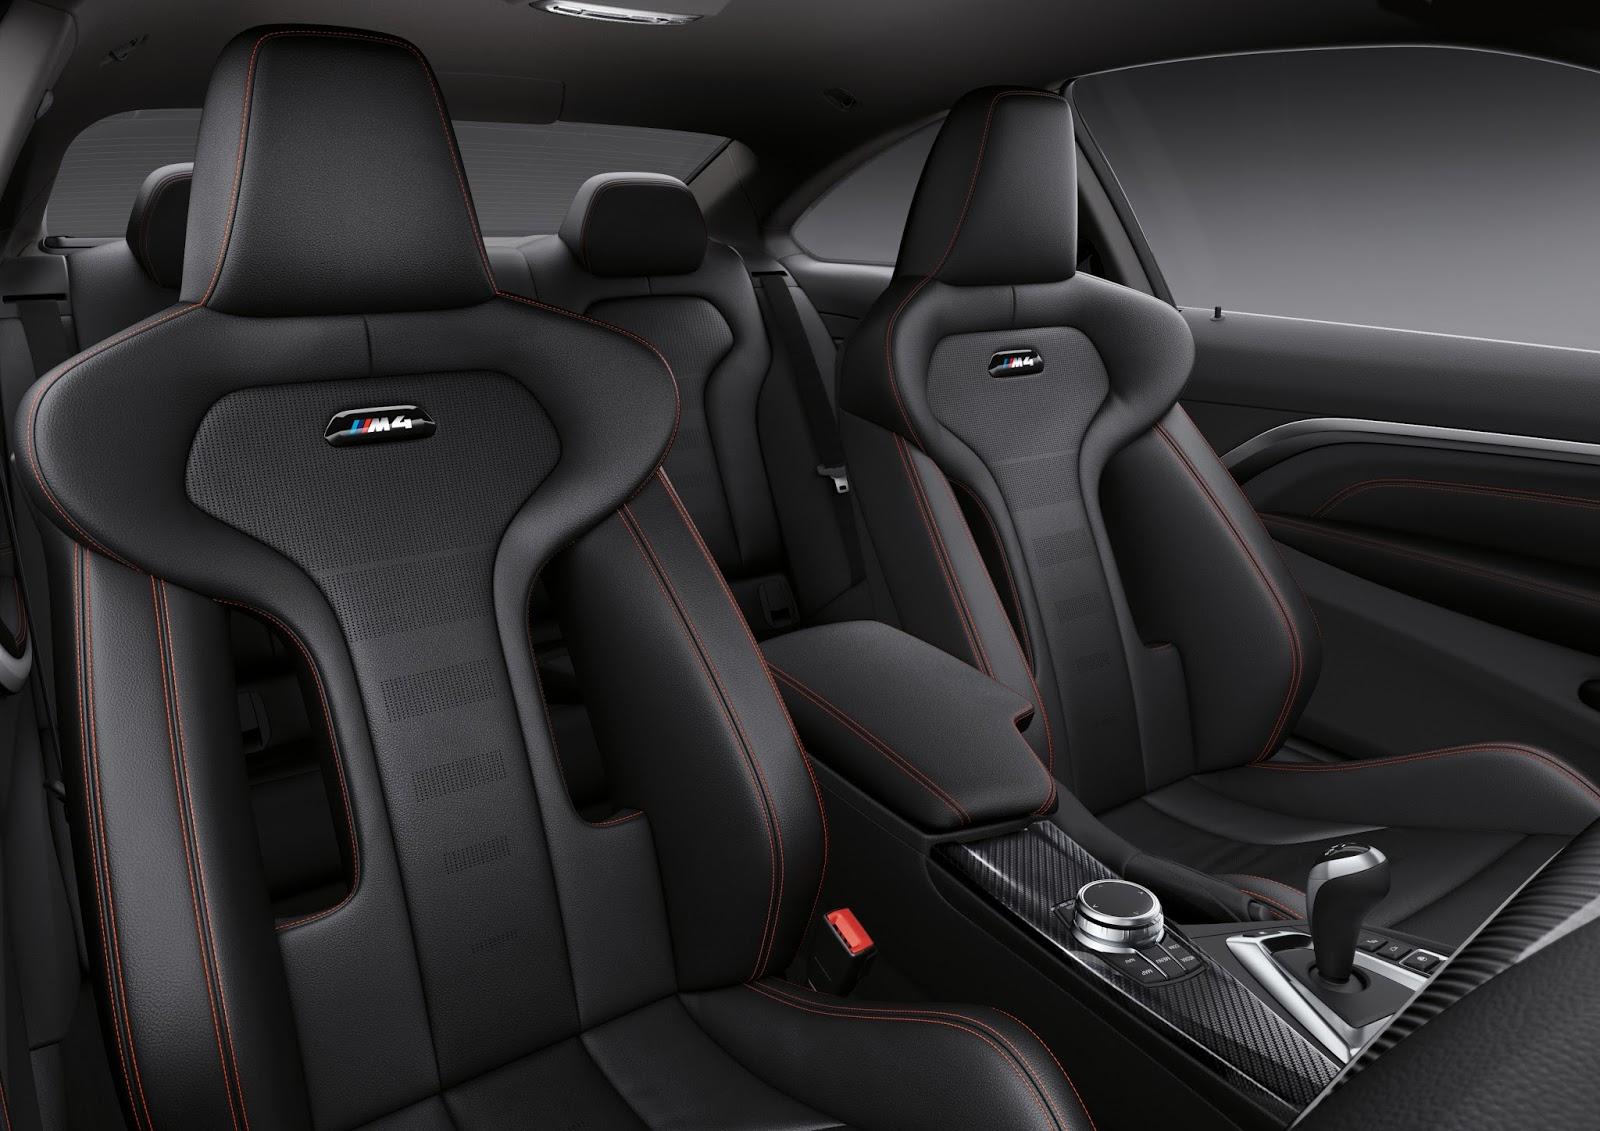 P90244957 highRes bmw m4 coup 01 2017 Η νέα BMW Σειρά 4, με πιο σφιχτή ρύθμιση ανάρτησης BMW, Bmw 4, BMW 4 Cabrio, BMW 4 Coupe, BMW 4 Gran Coupé, Facelift